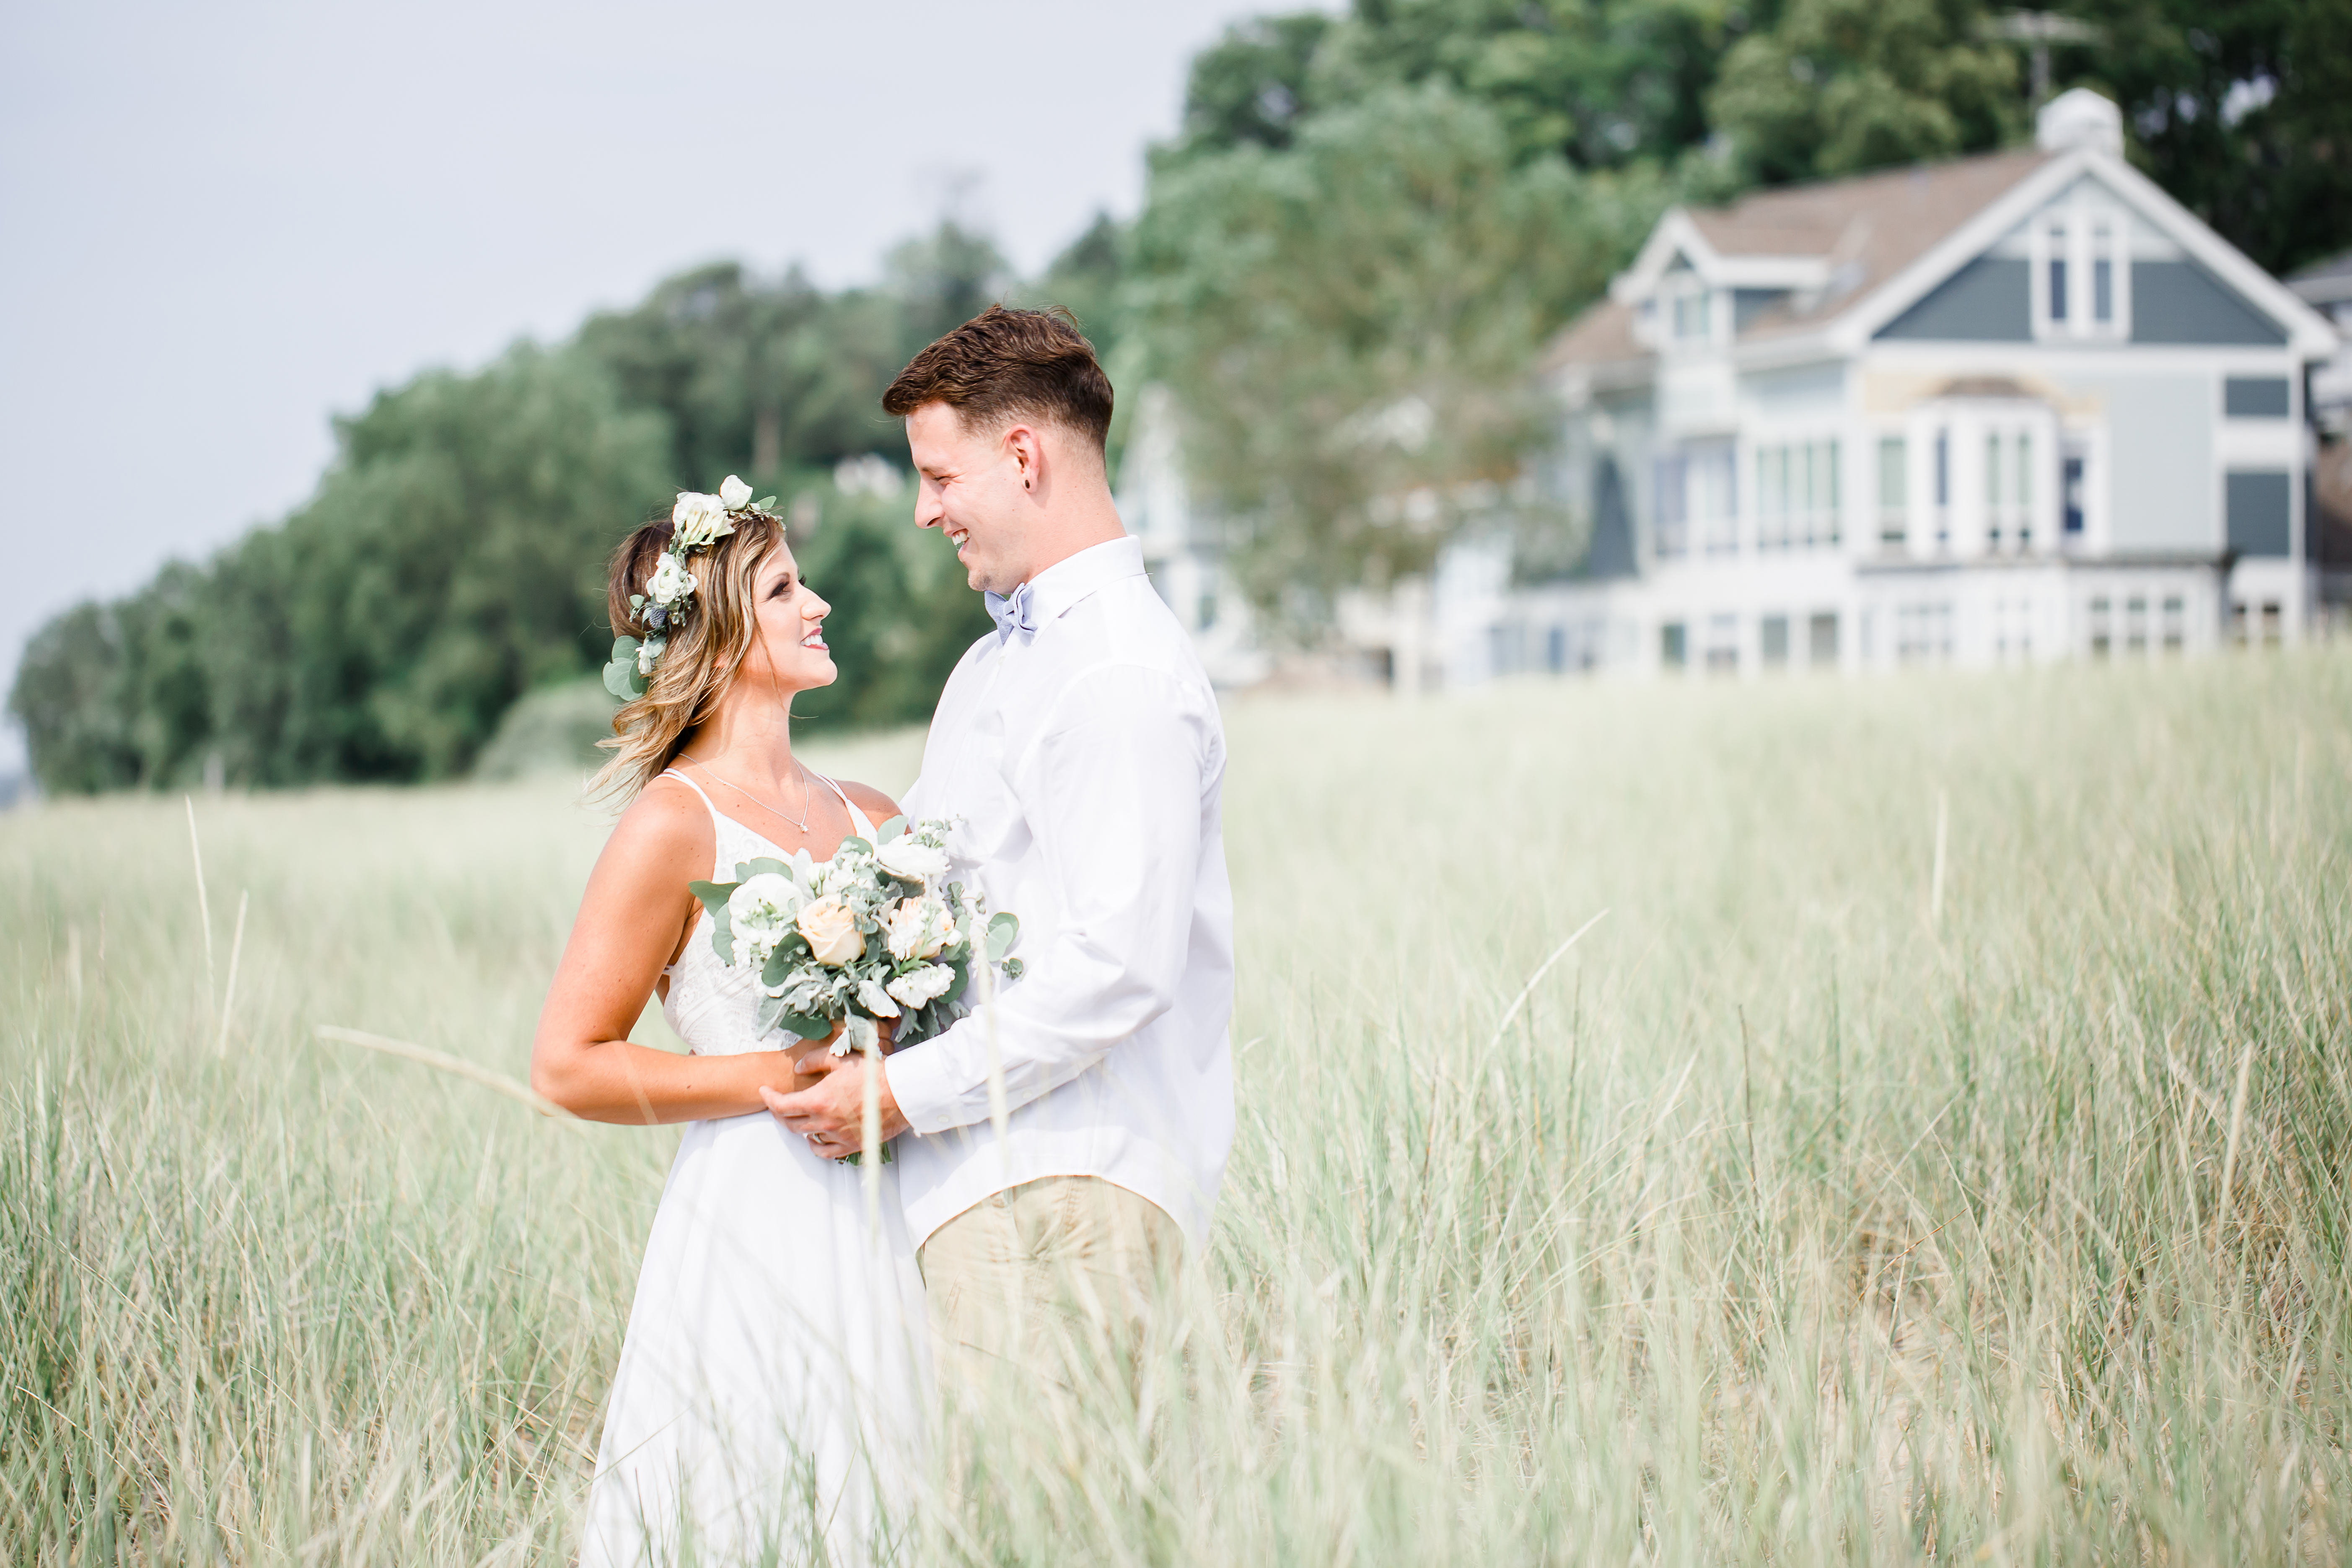 wedding-picture-ideas-lake-wedding-weddi